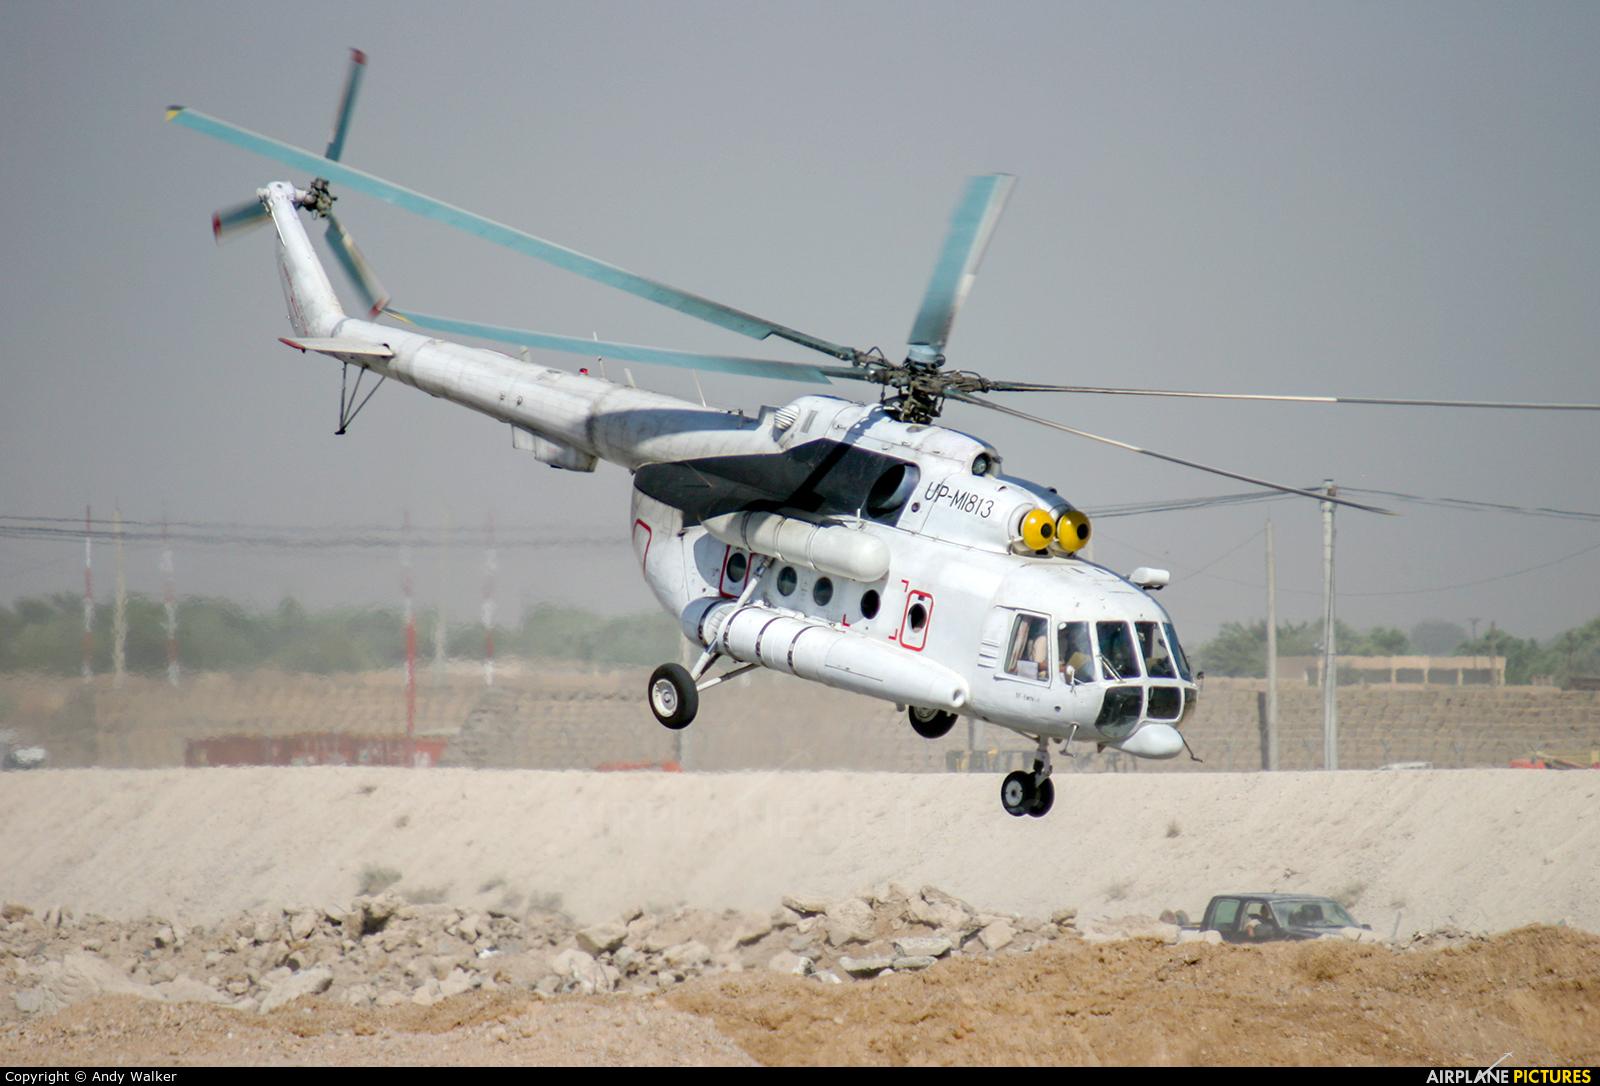 BarundaiAvia UP-MI813 aircraft at Kandahar